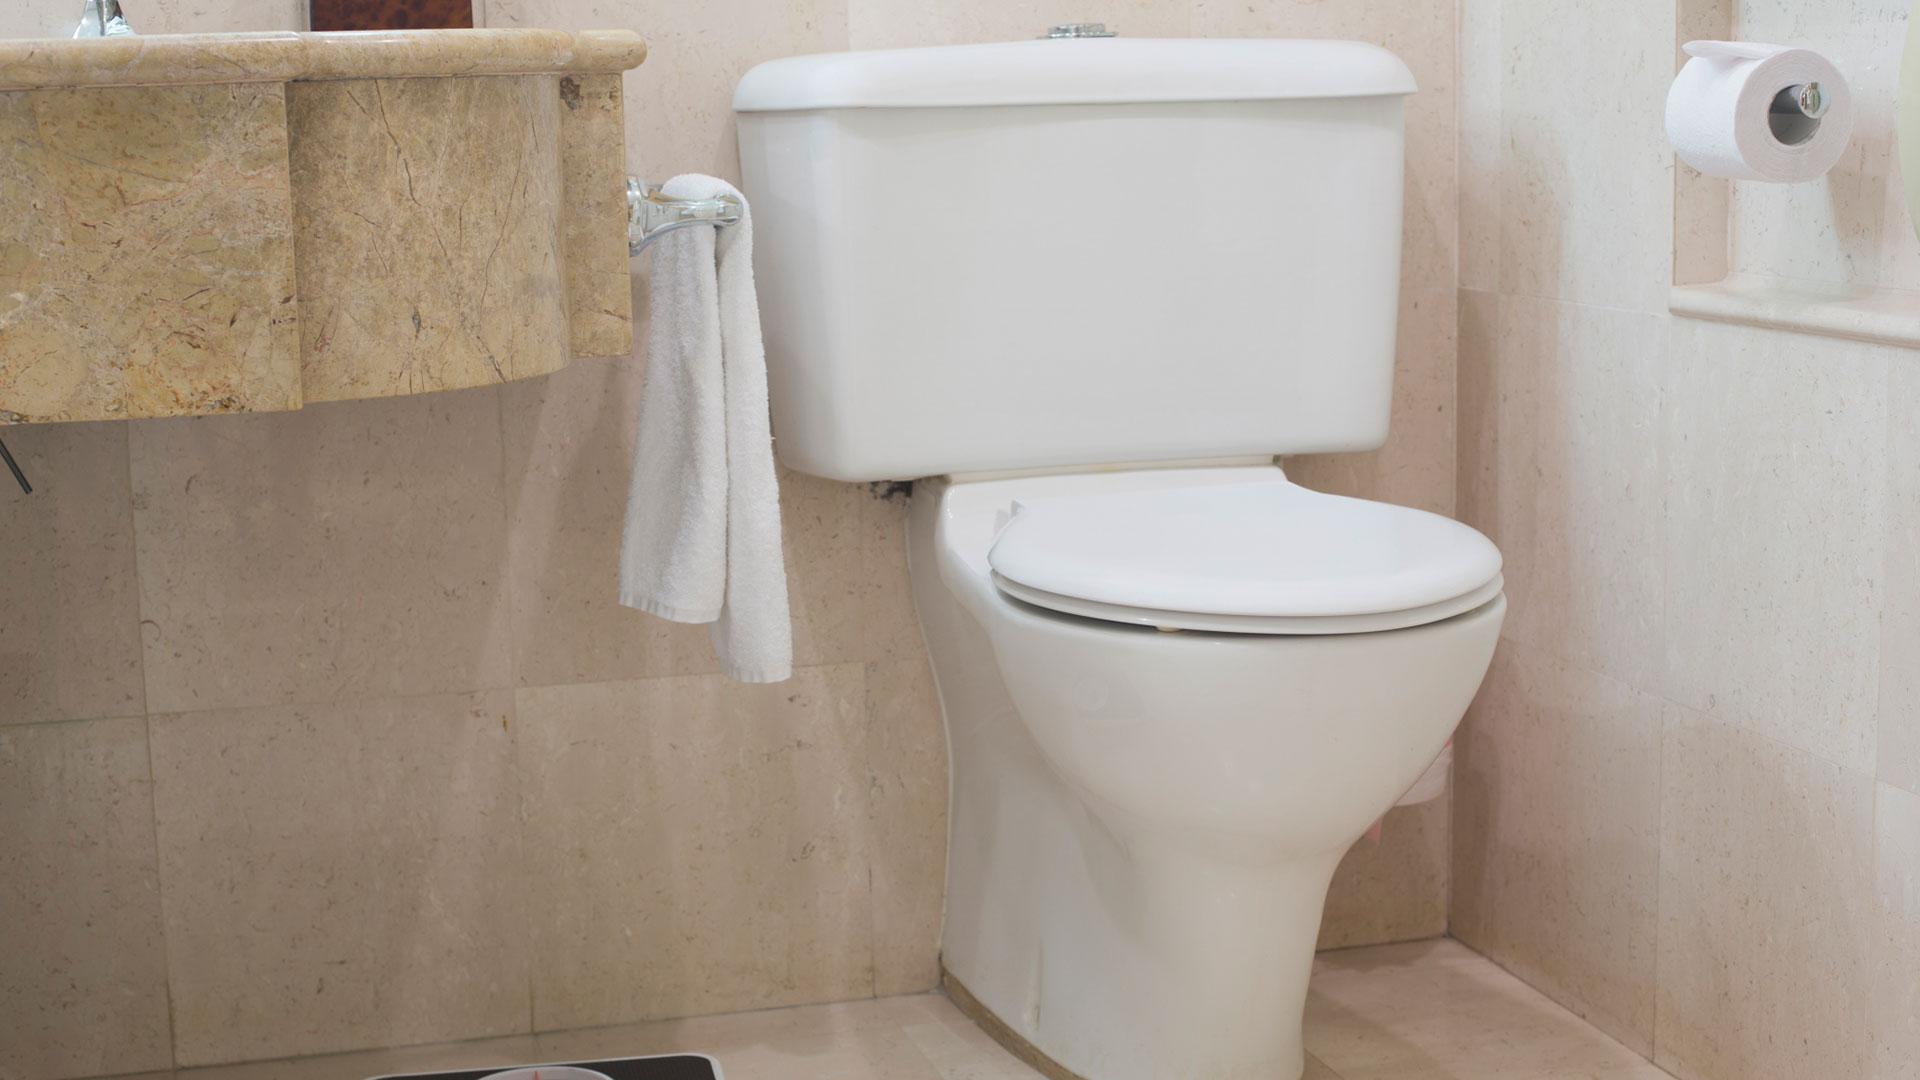 Toilet | PregnancyAndBaby.com